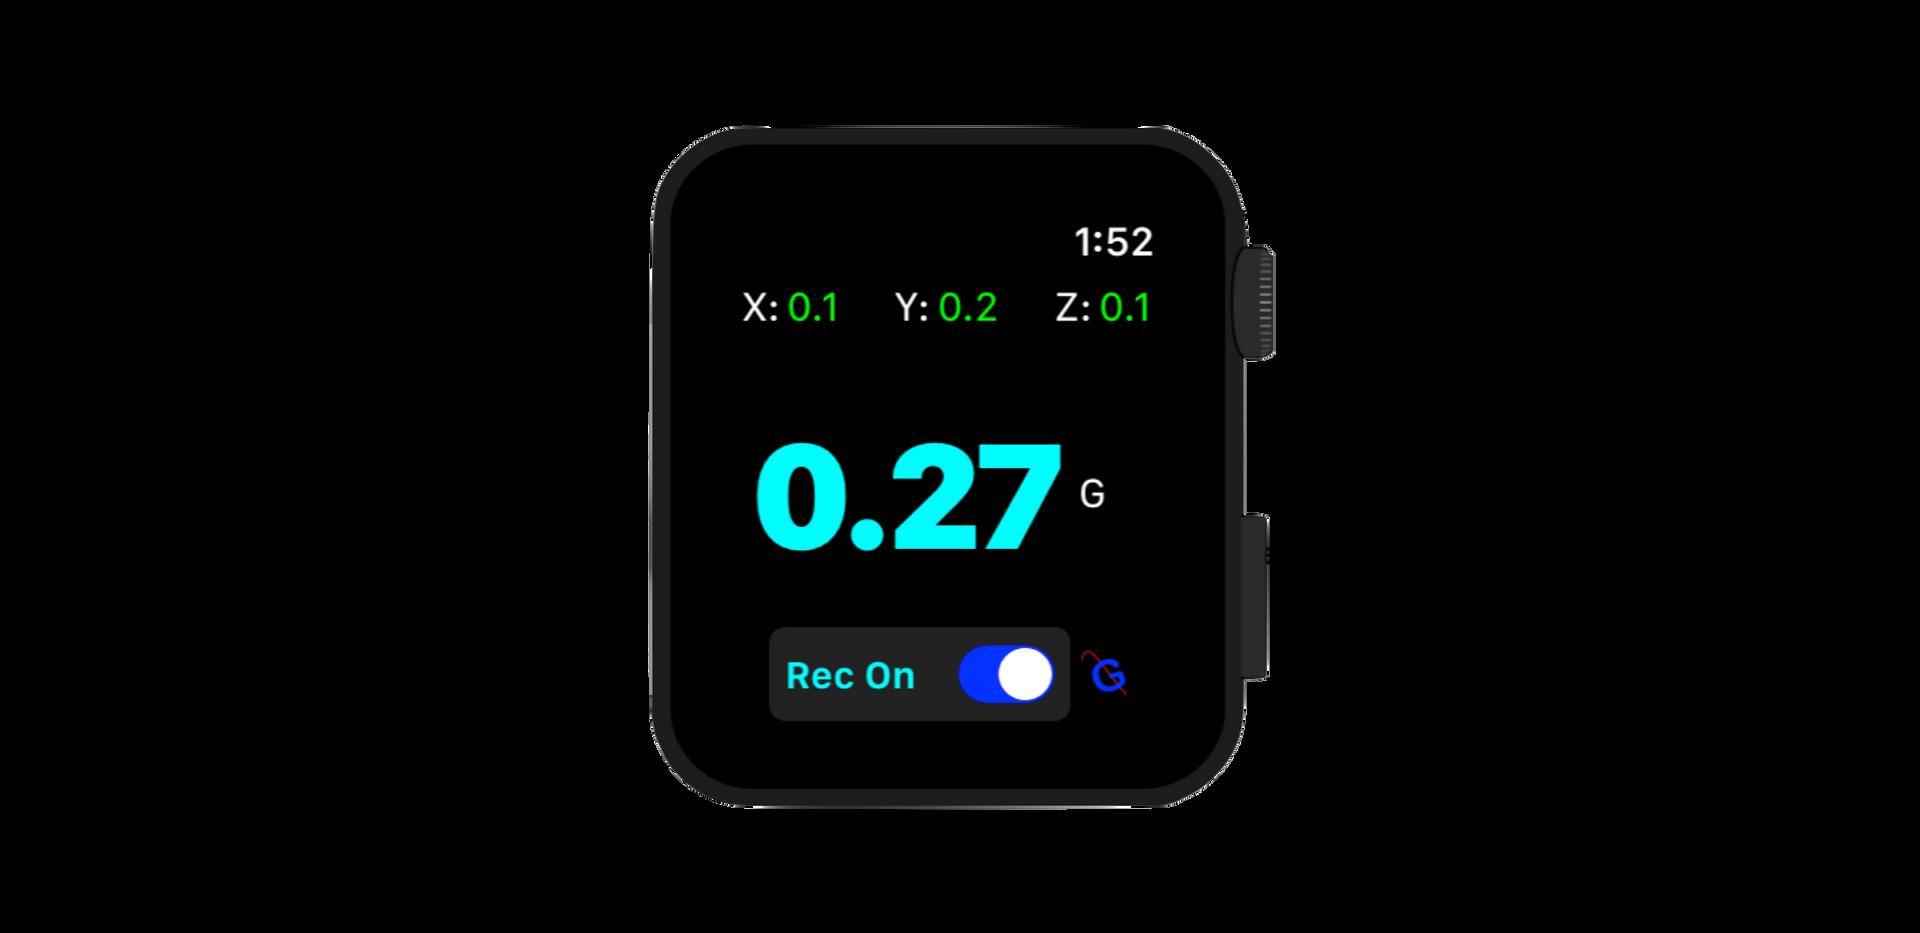 Apple Watch extension of GFR Flight.